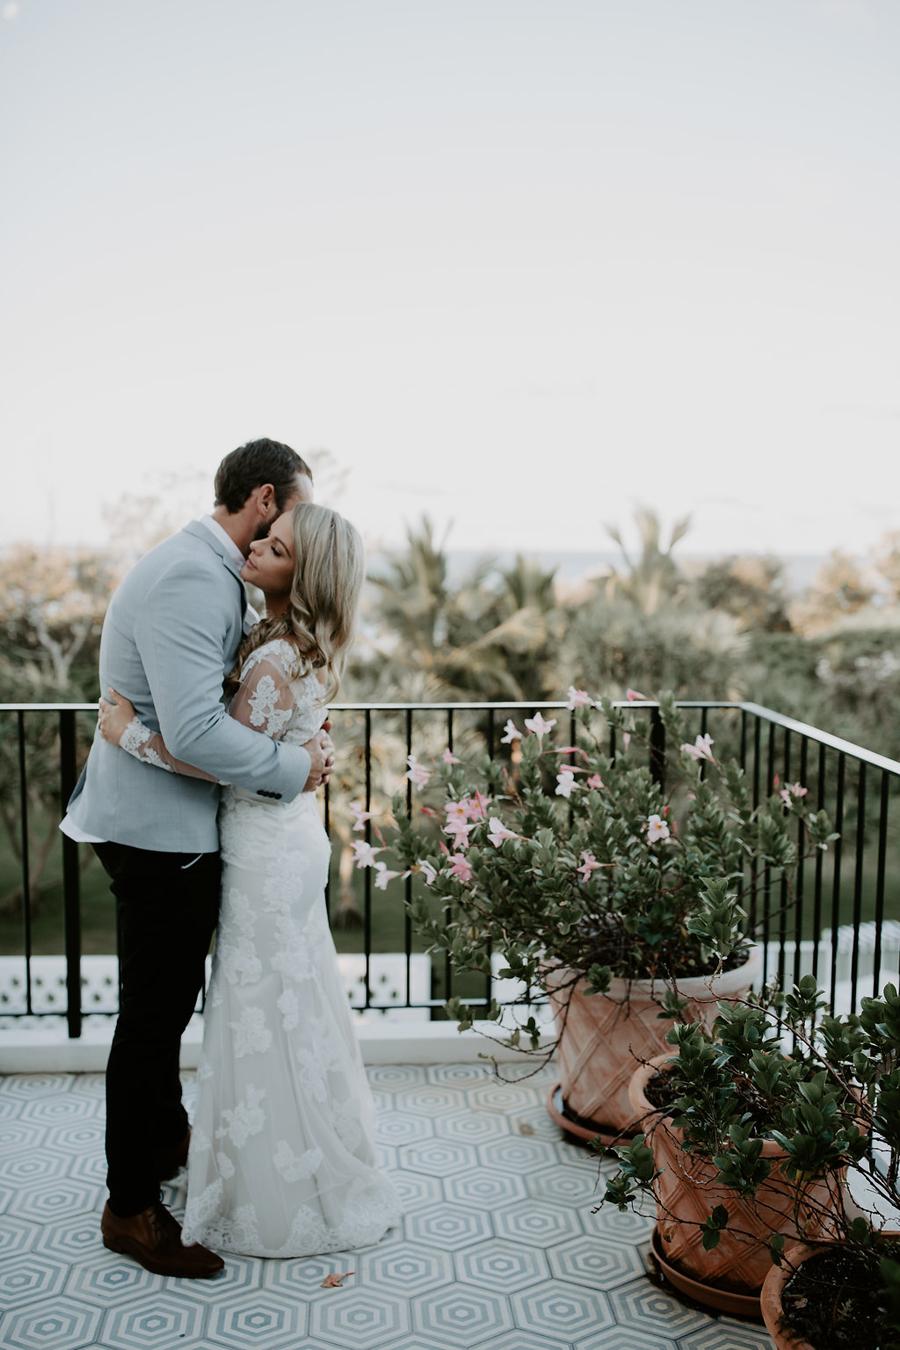 osteria-casuarina-wedding-venue-tweed-coast-weddings-coastal-garden-reception-real-wedding037.jpg